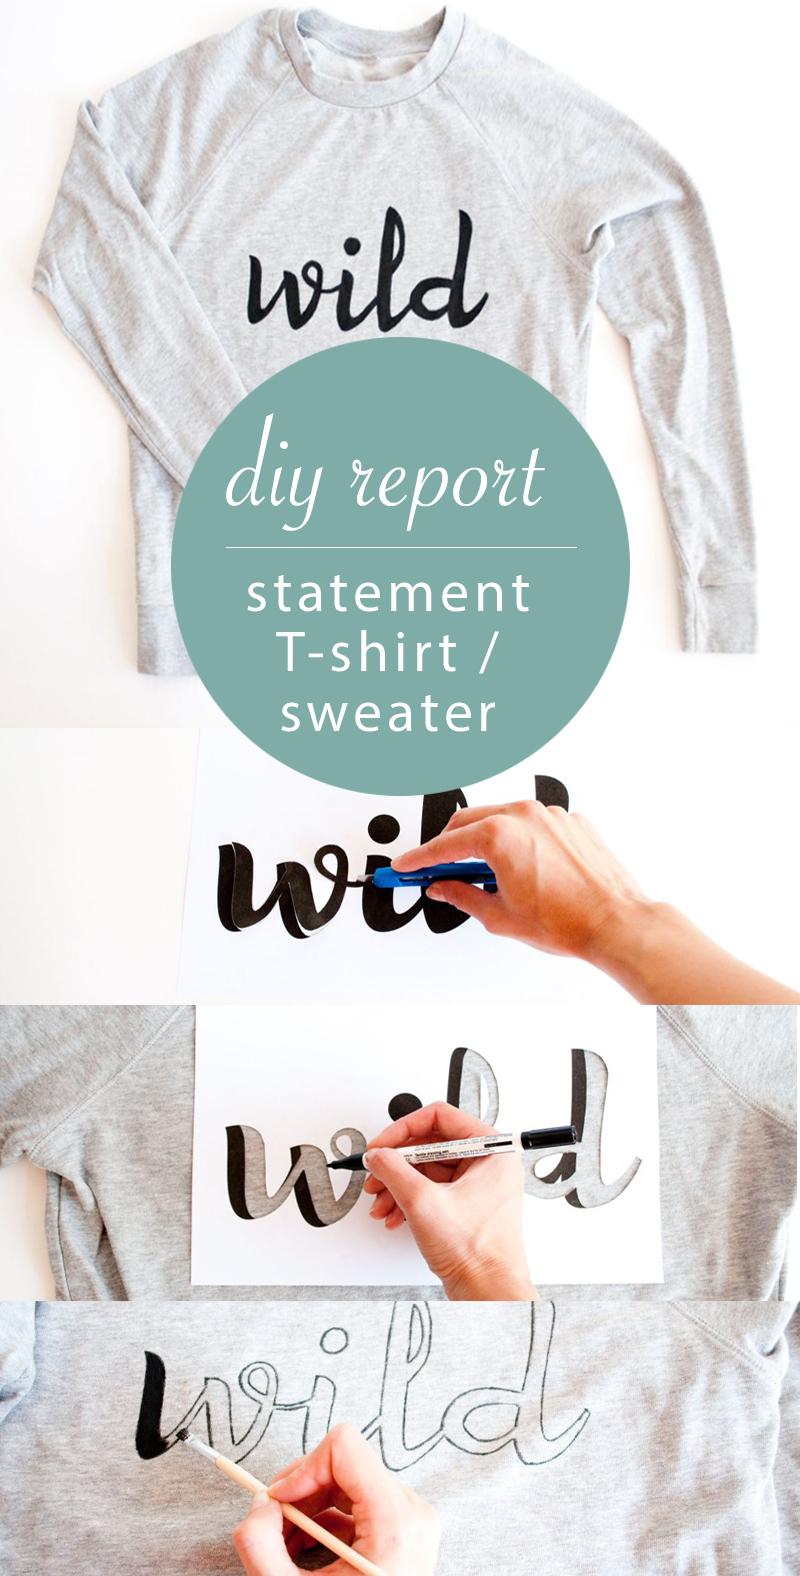 diy statement t shirt report